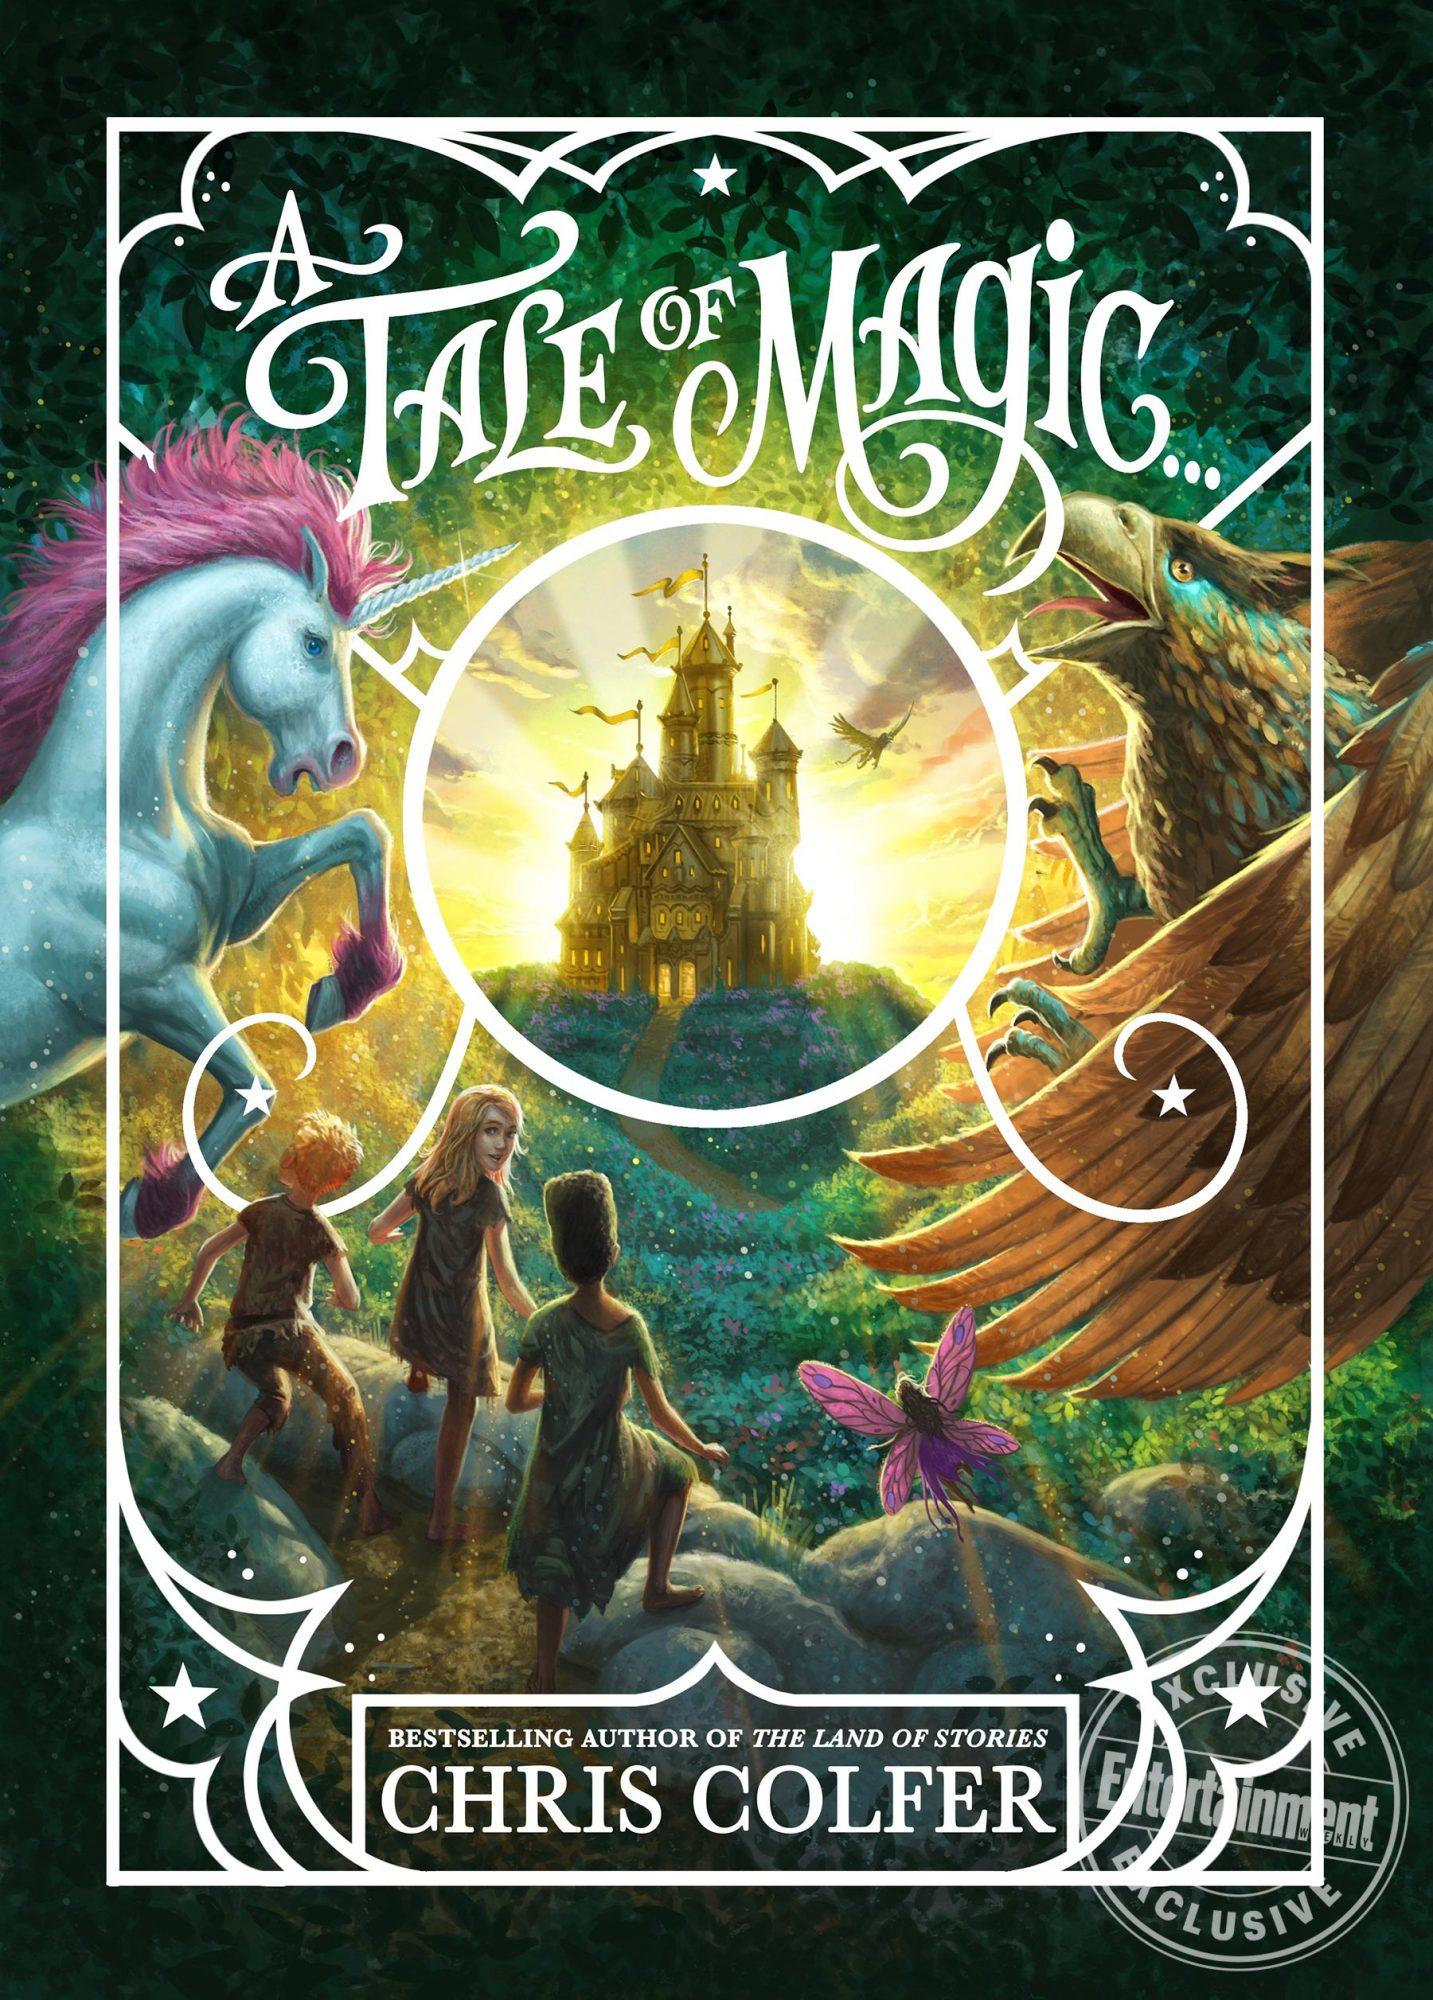 A-Tale-of-Magic-Cover--(1)